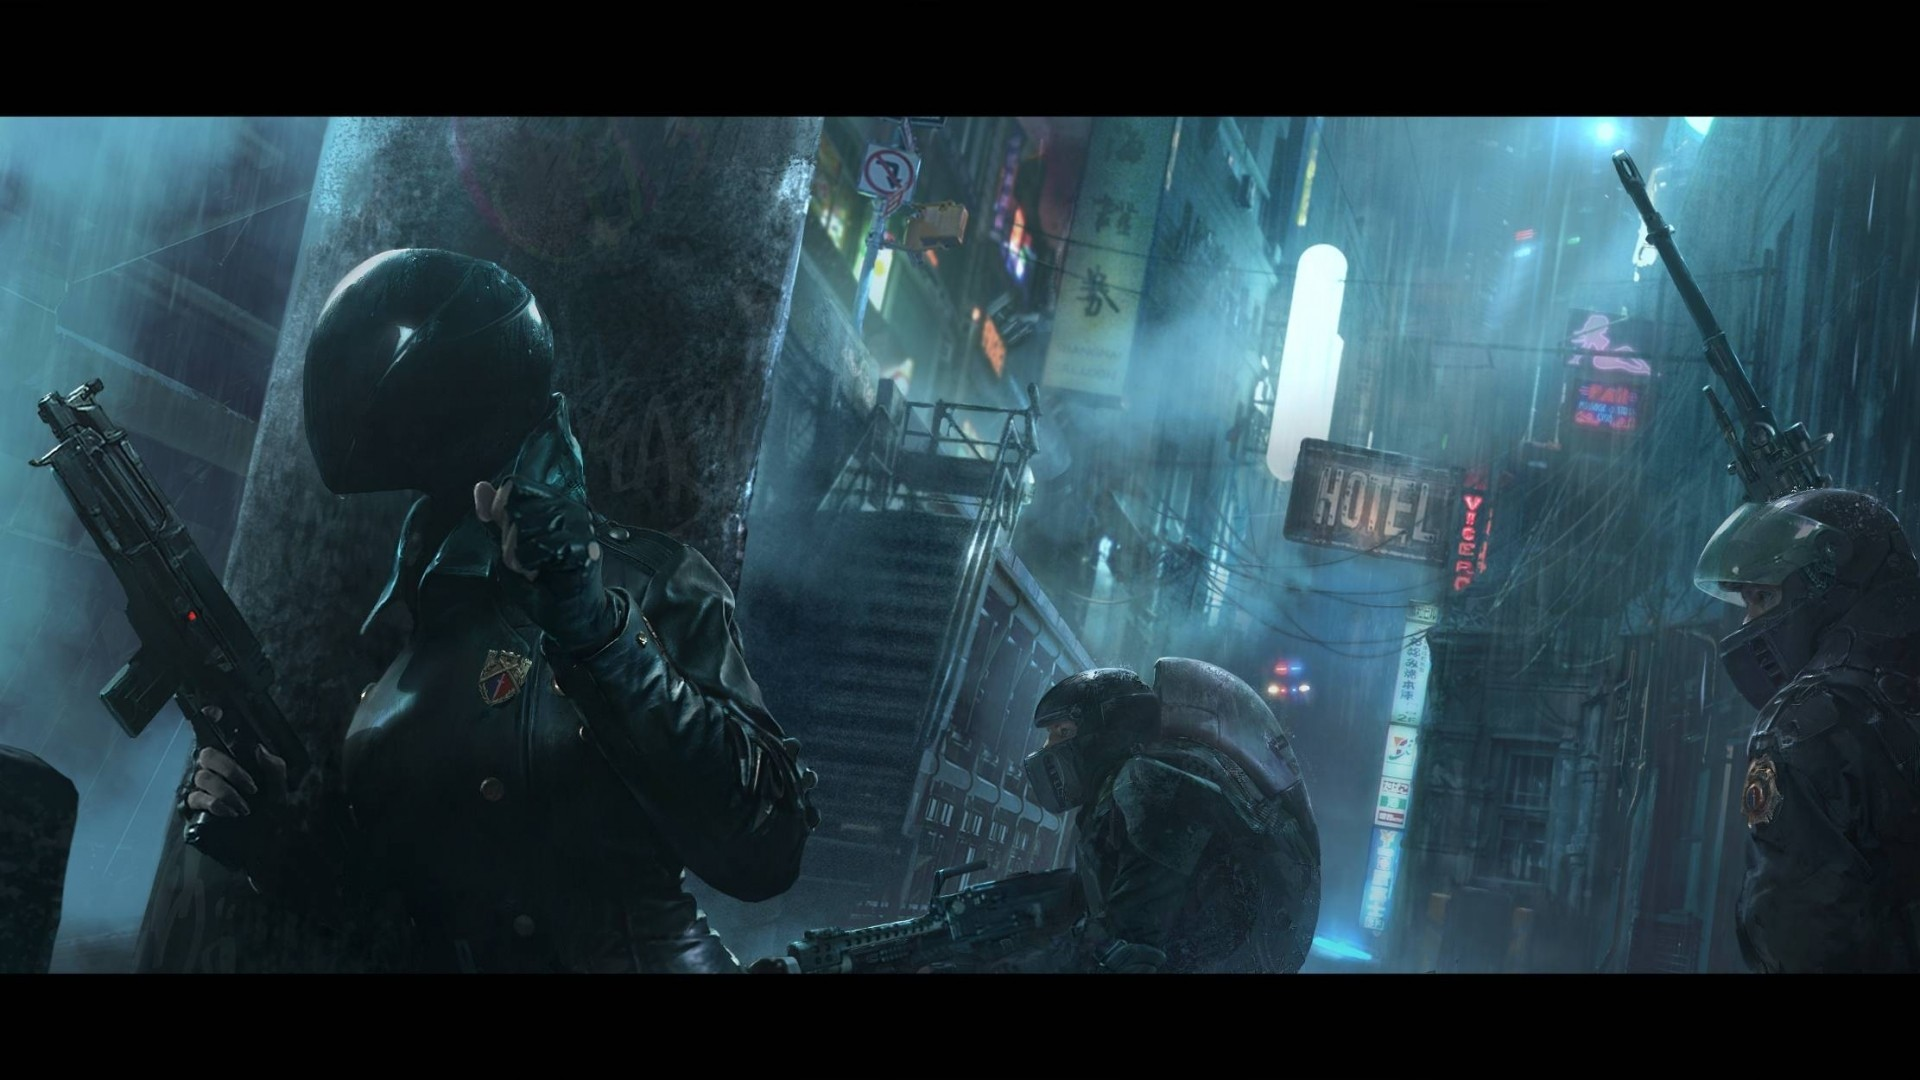 Women Warrior Artwork Sword Rain Cyberpunk Cyberpunk: Cyberpunk Wallpaper